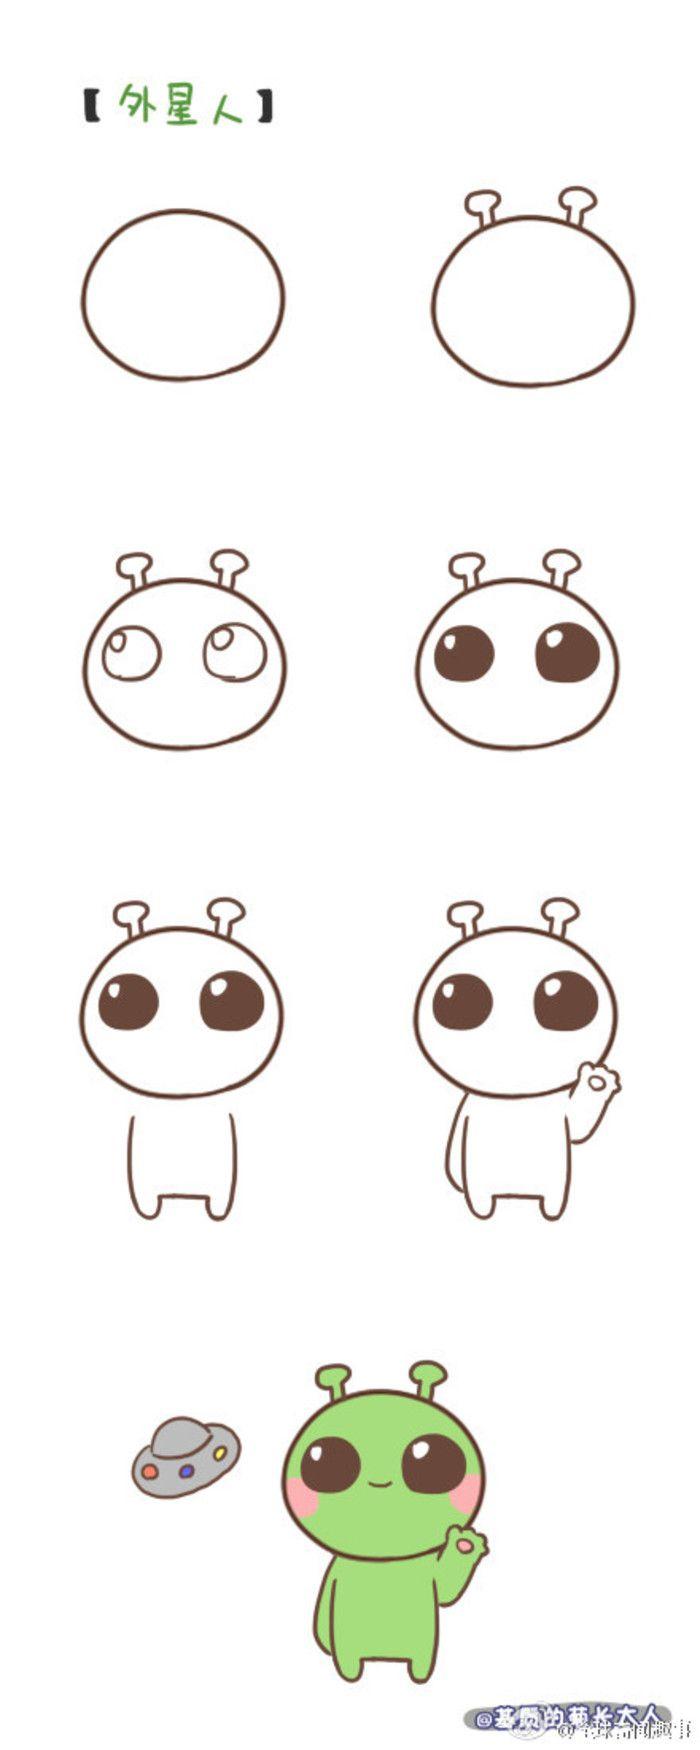 Le Enseñará A Dibujar Un Círculo Grupo Permanecer Meng Animales